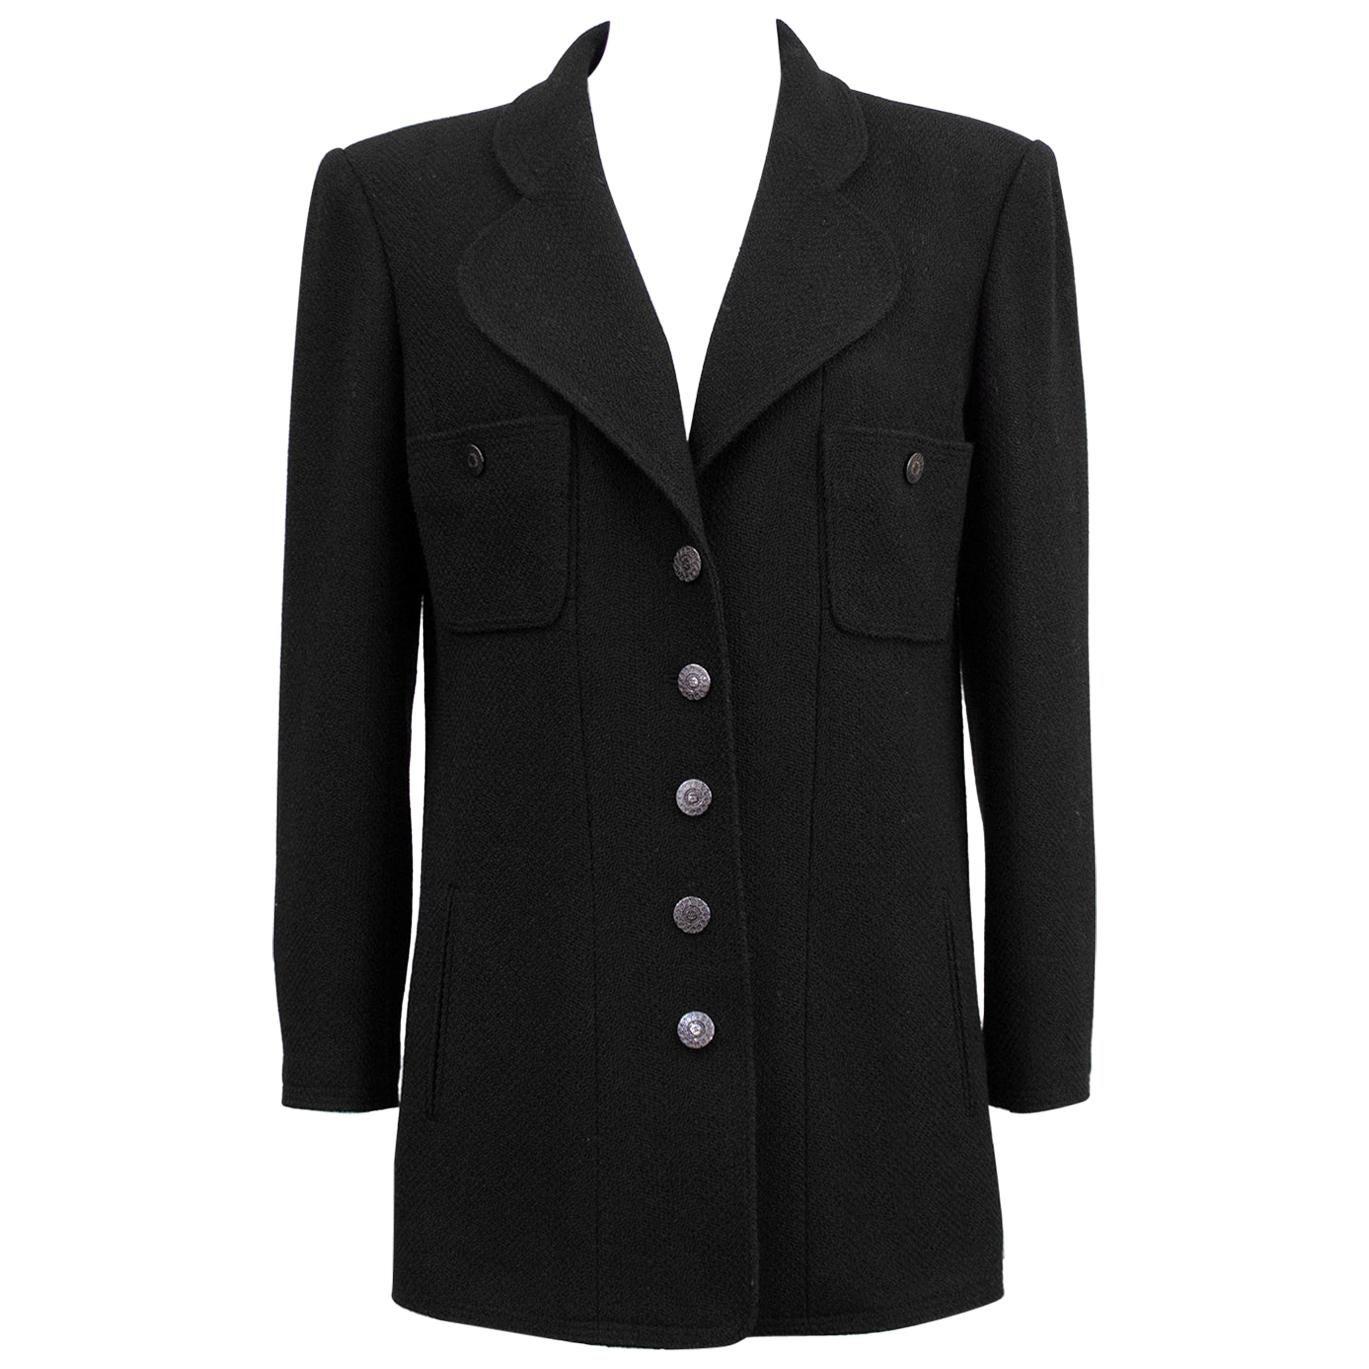 Chanel Fall 1997 Black Wool Jacket